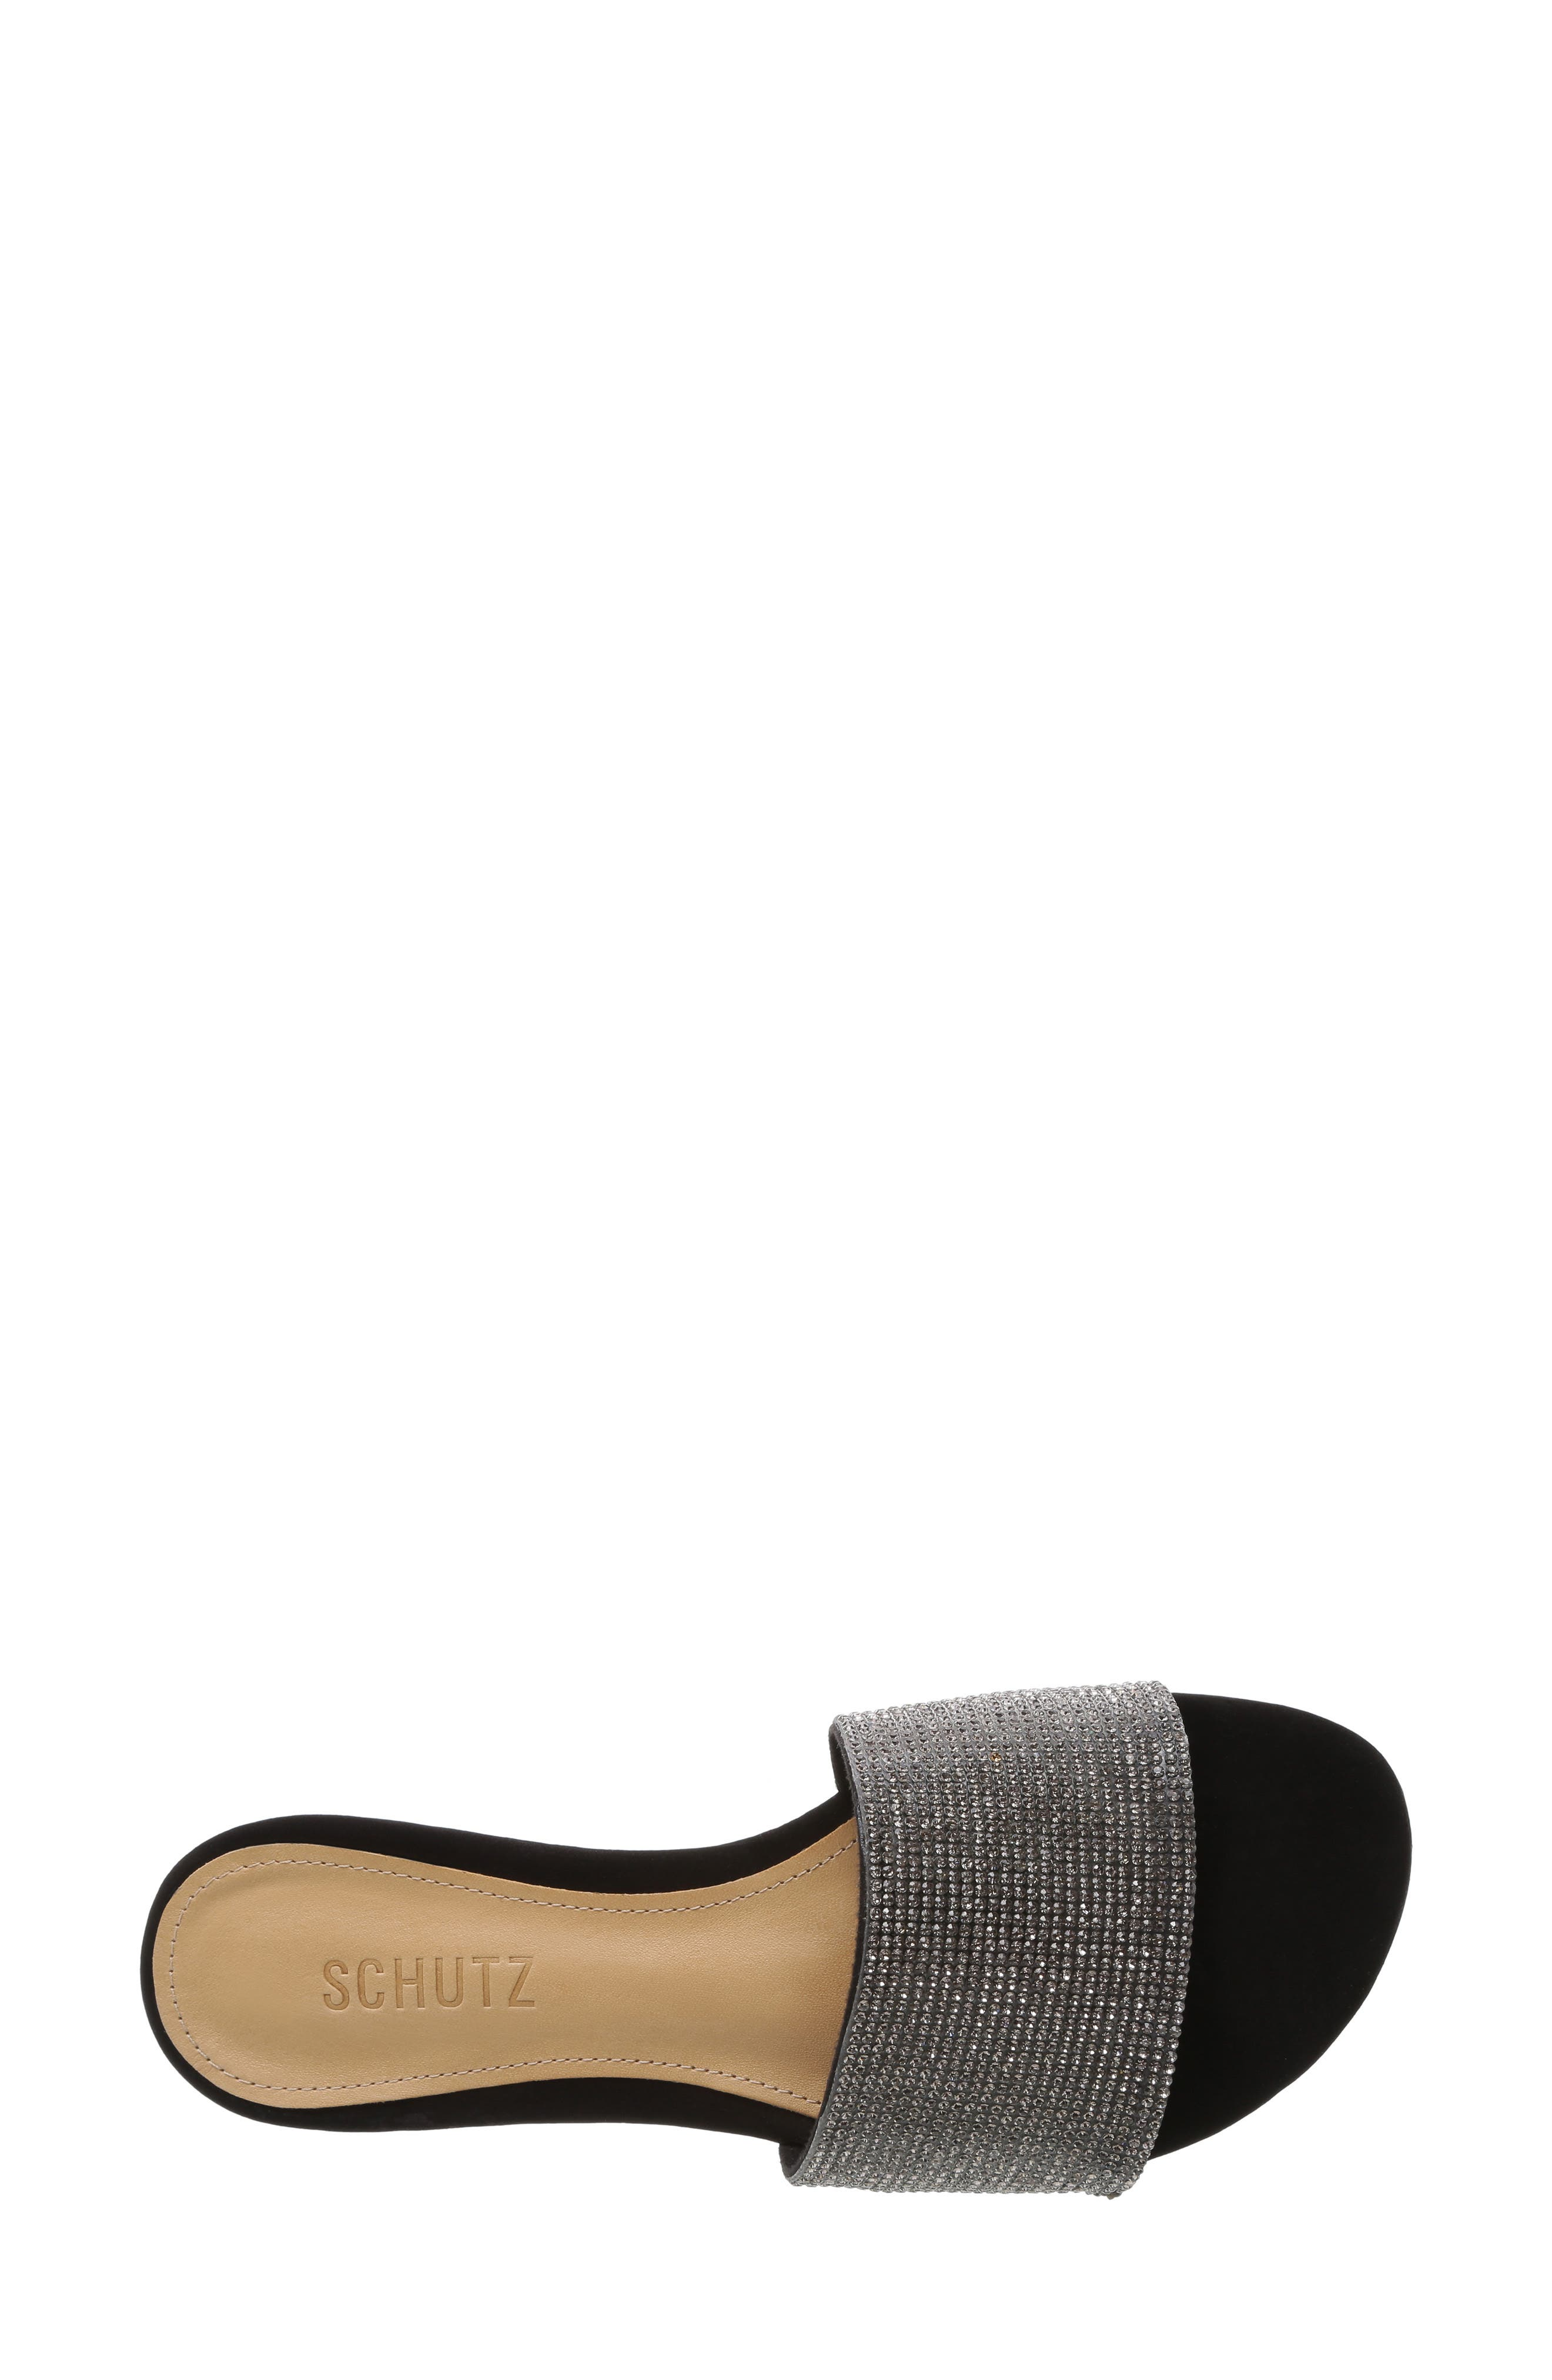 SCHUTZ, Queren Embellished Slide Sandal, Alternate thumbnail 4, color, BLACK/ BLACK DIAMOND FABRIC